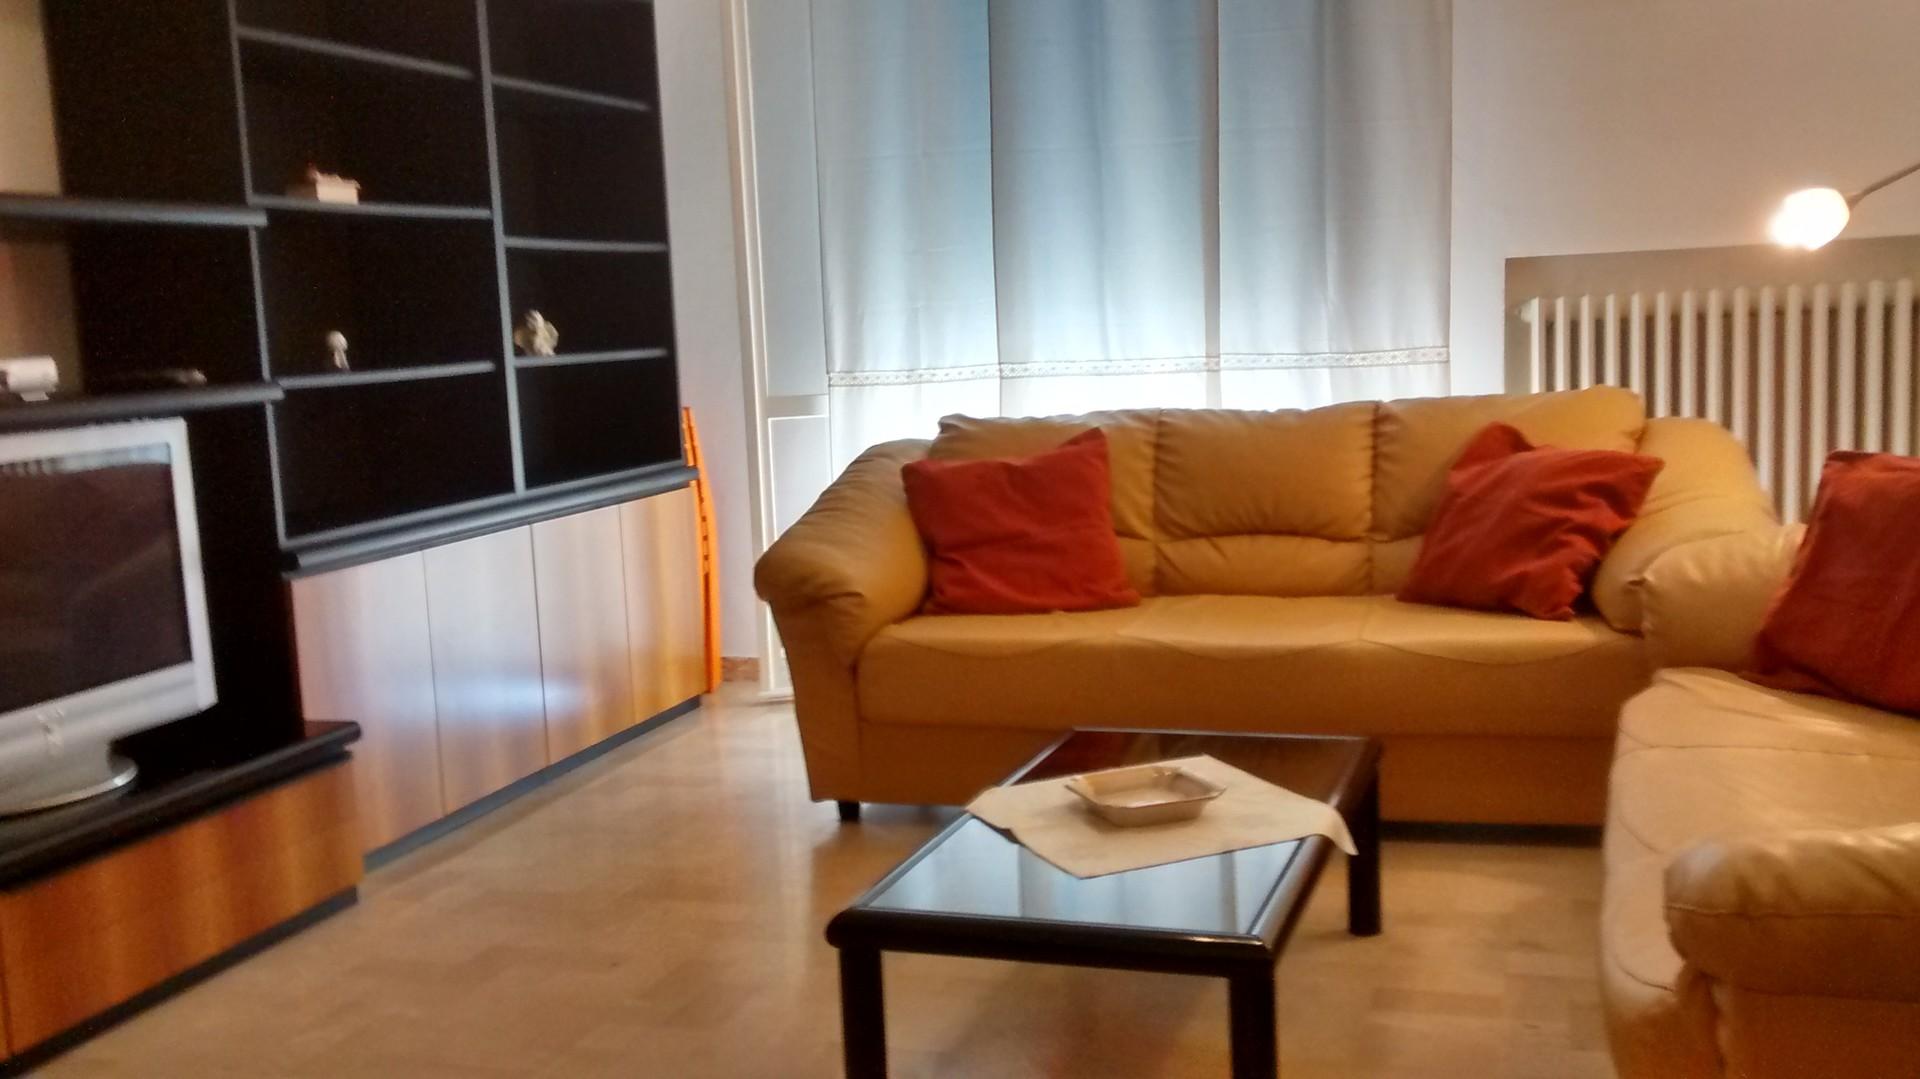 appartamento-n-3-stanze-n-2-bagni-comodo-9a3b851f1c39aa75145bdf0027e2c082